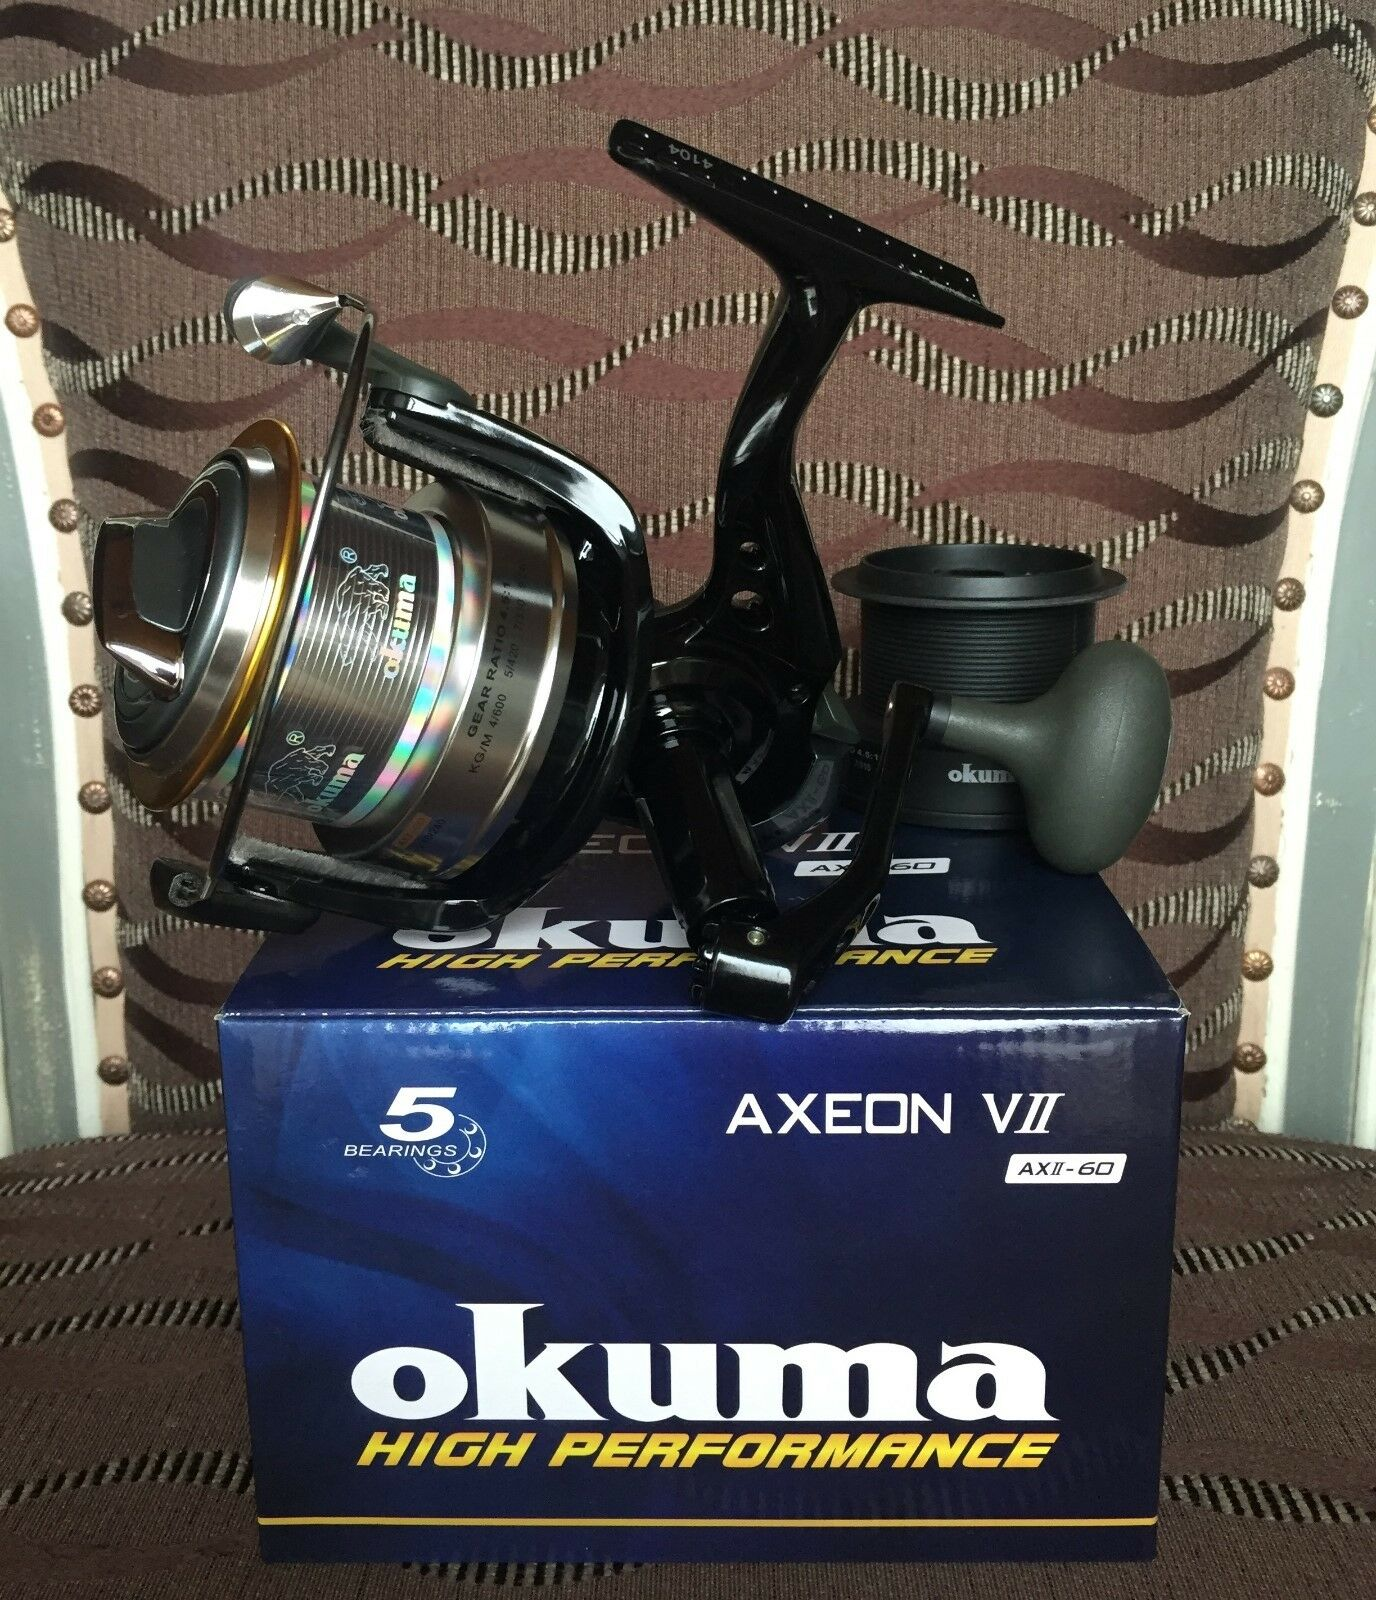 Okuma Karpfenrolle Axeon VII AXII-60 Karpfenrolle Okuma 500169